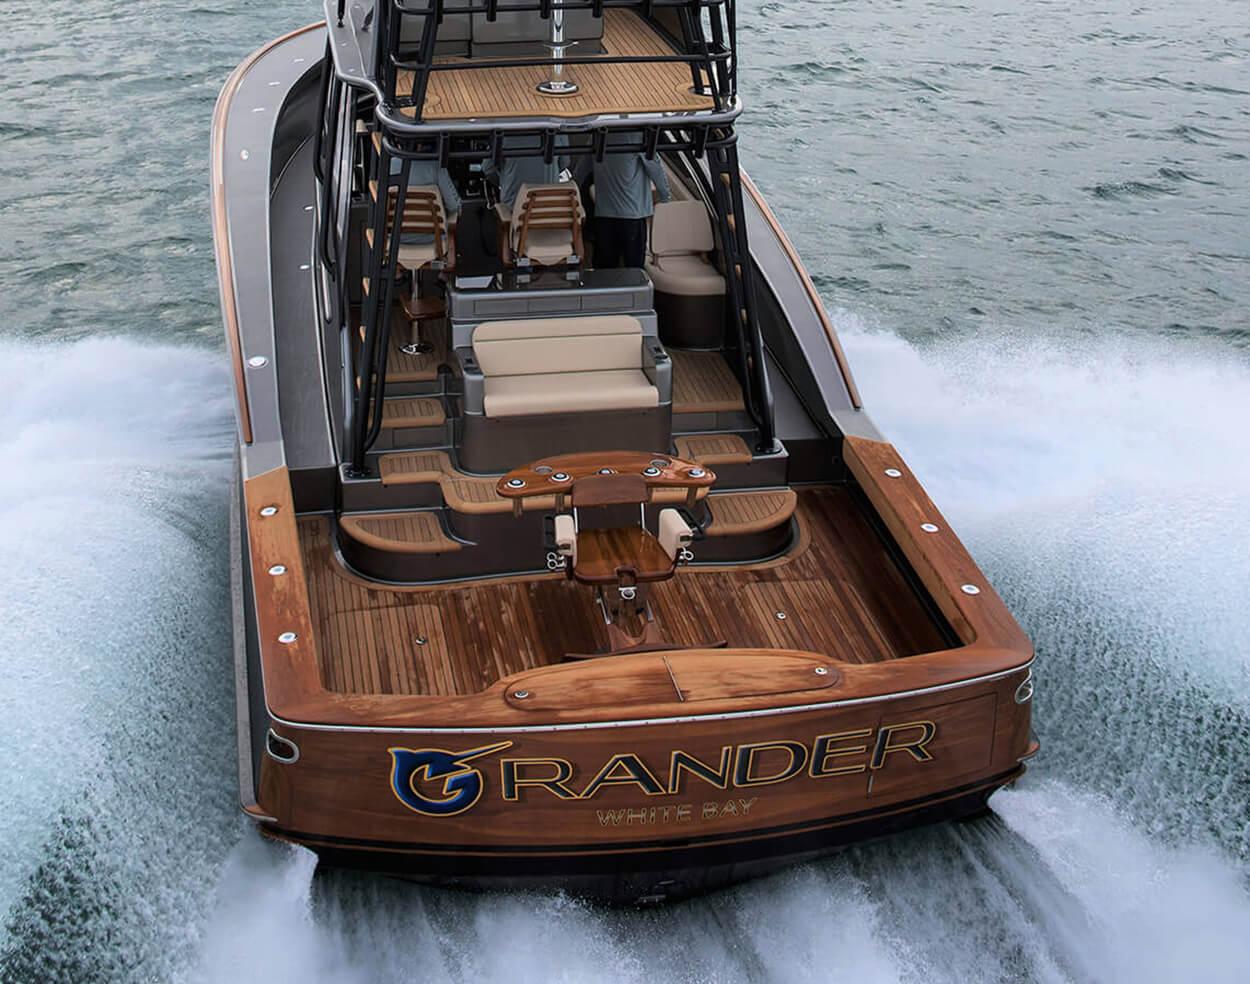 Grander White Bay Boat Transom